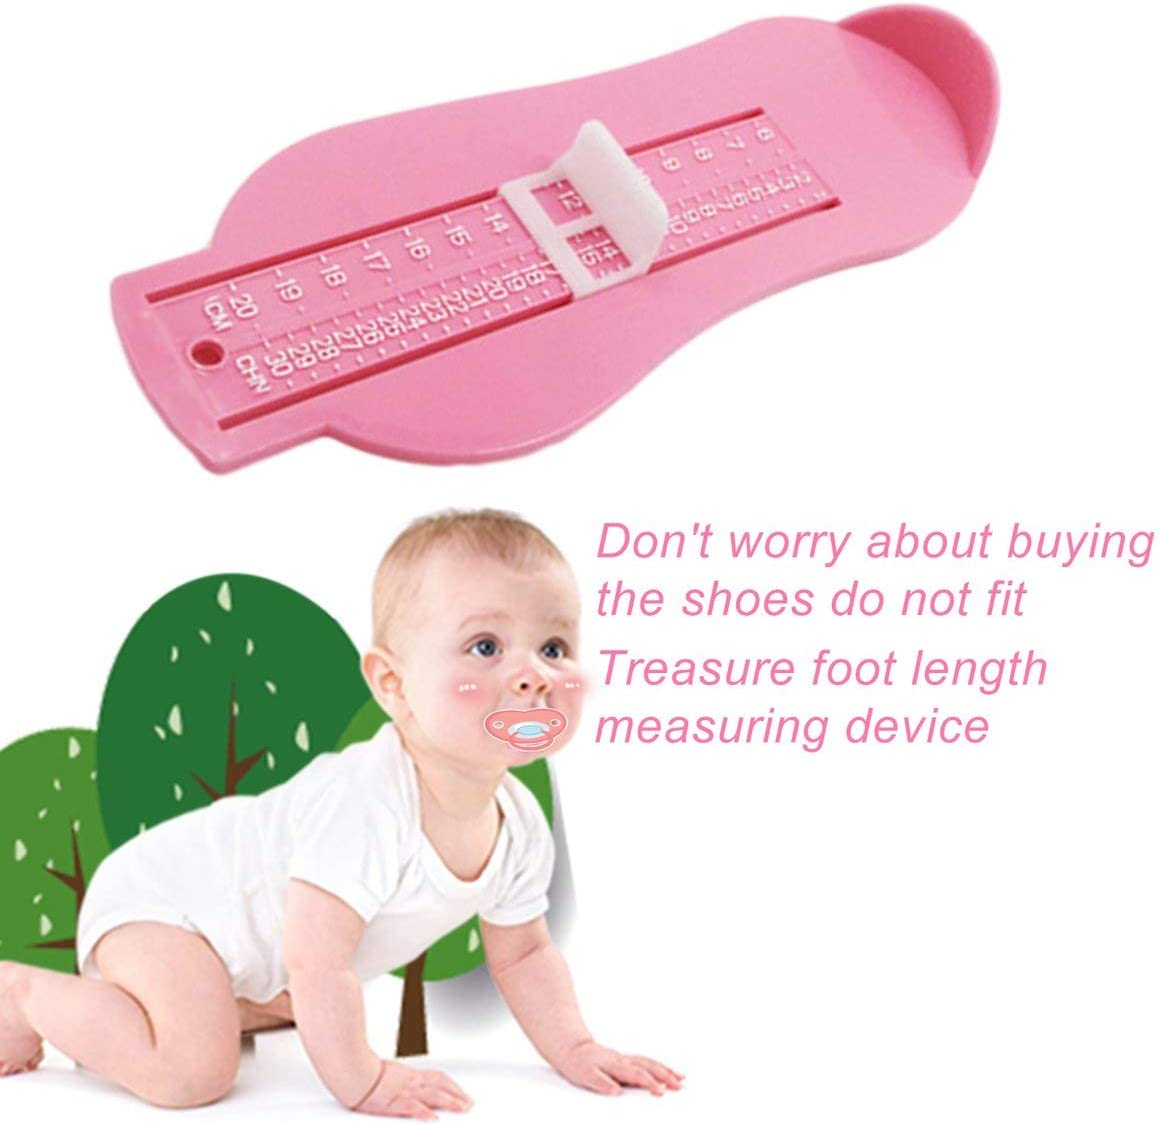 Kids Foot Measure Tool Shoes Helper Shoes Size Calculator Children Infant Feet Measuring Ruler Tool Baby Shoes Gauge Device MarinoBIRD